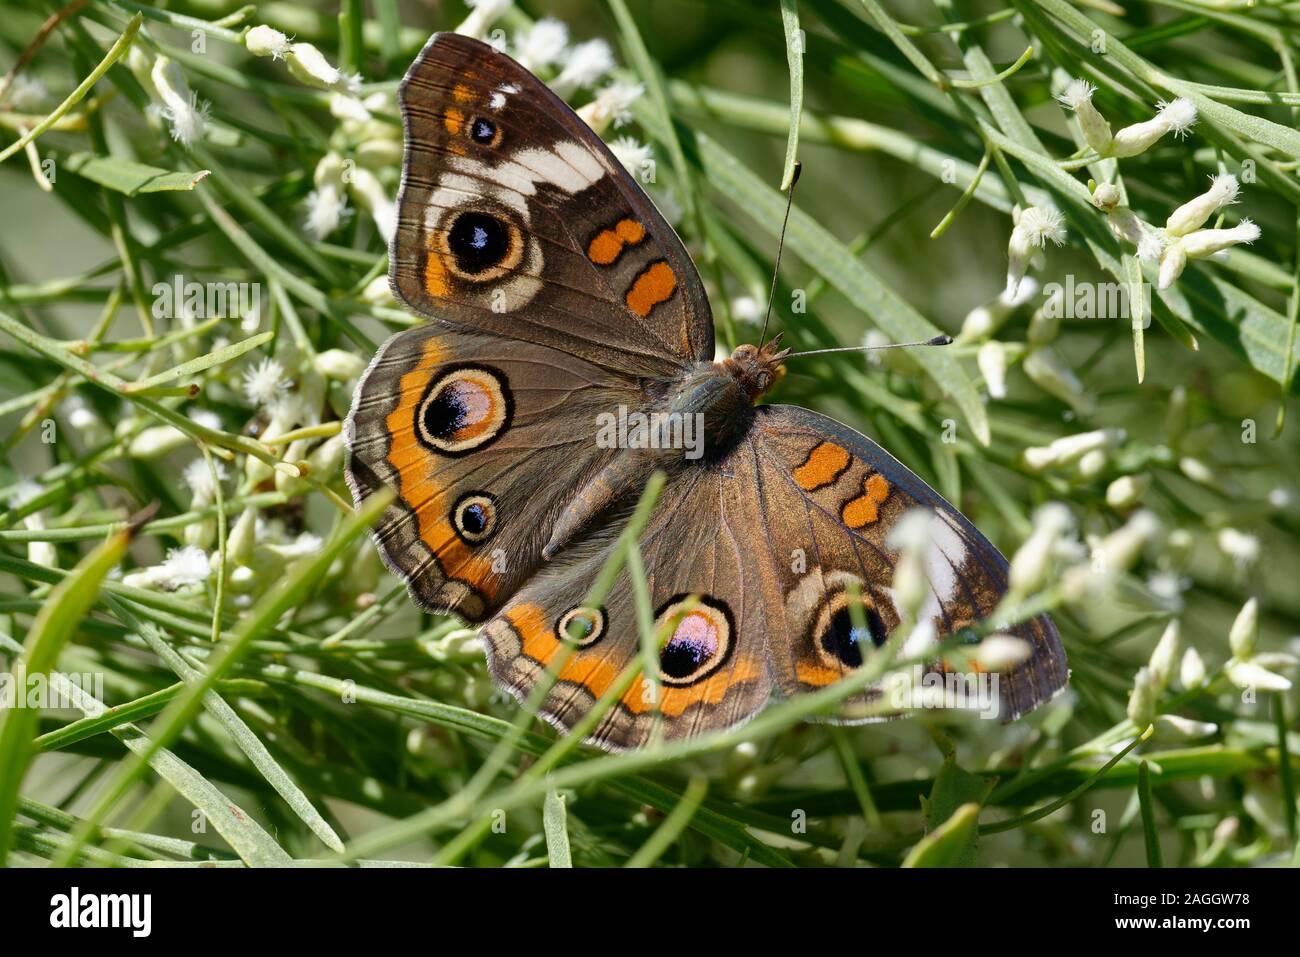 Common Buckeye Butterfly feeding on flowers Stock Photo